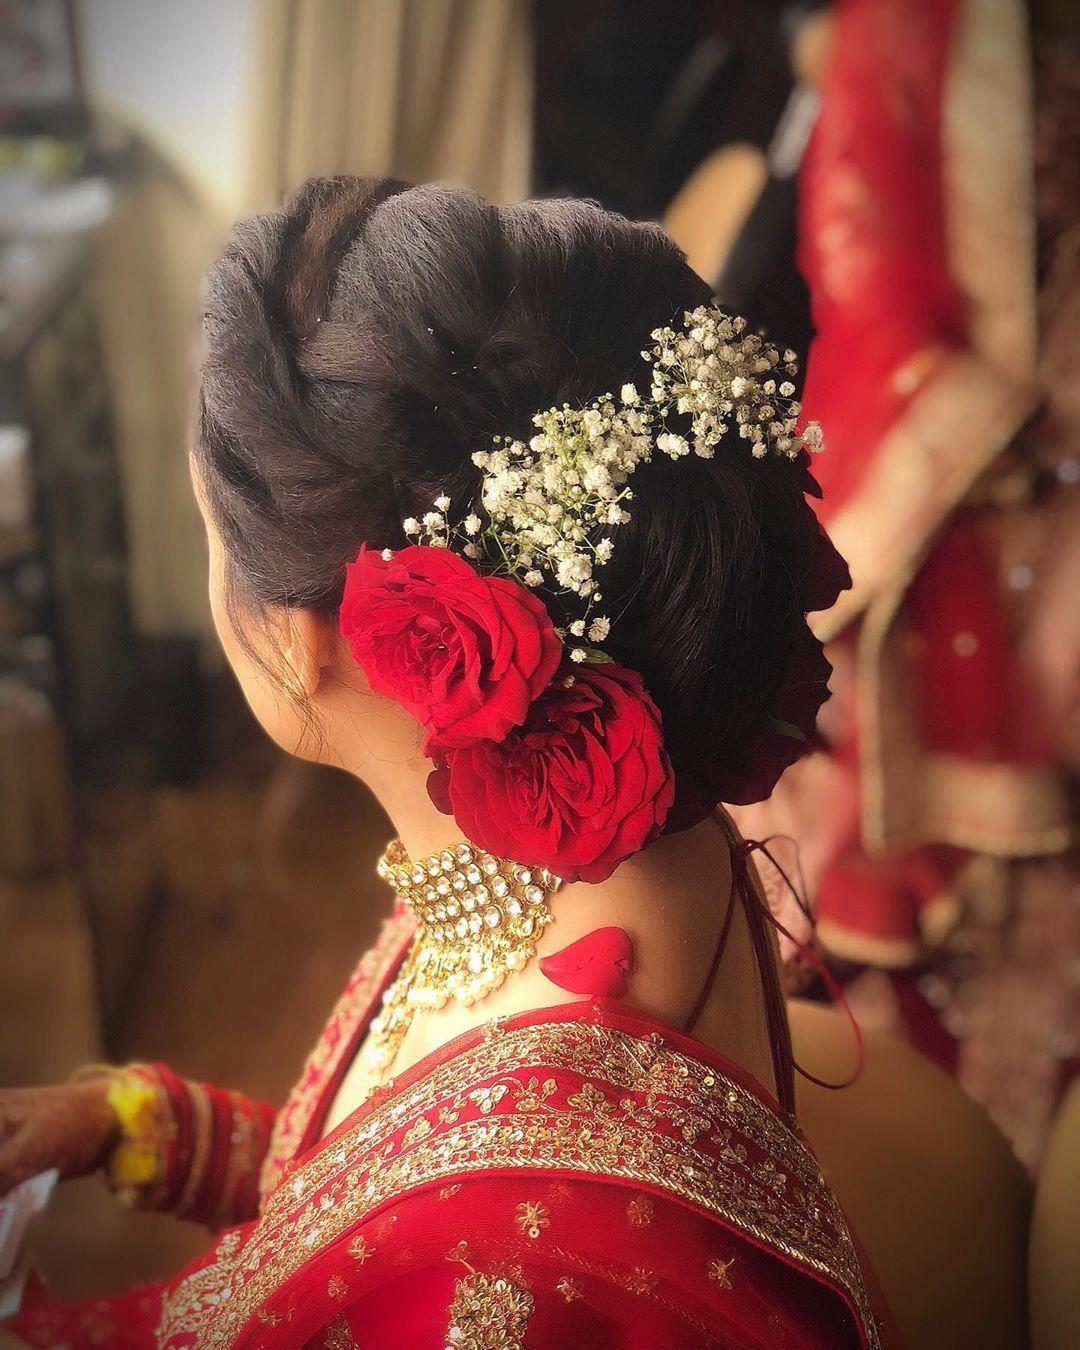 Pin By Vaishnavi Reddy On Hair Indian Wedding Hairstyles Bridal Hairstyle Indian Wedding Bridal Hair Buns